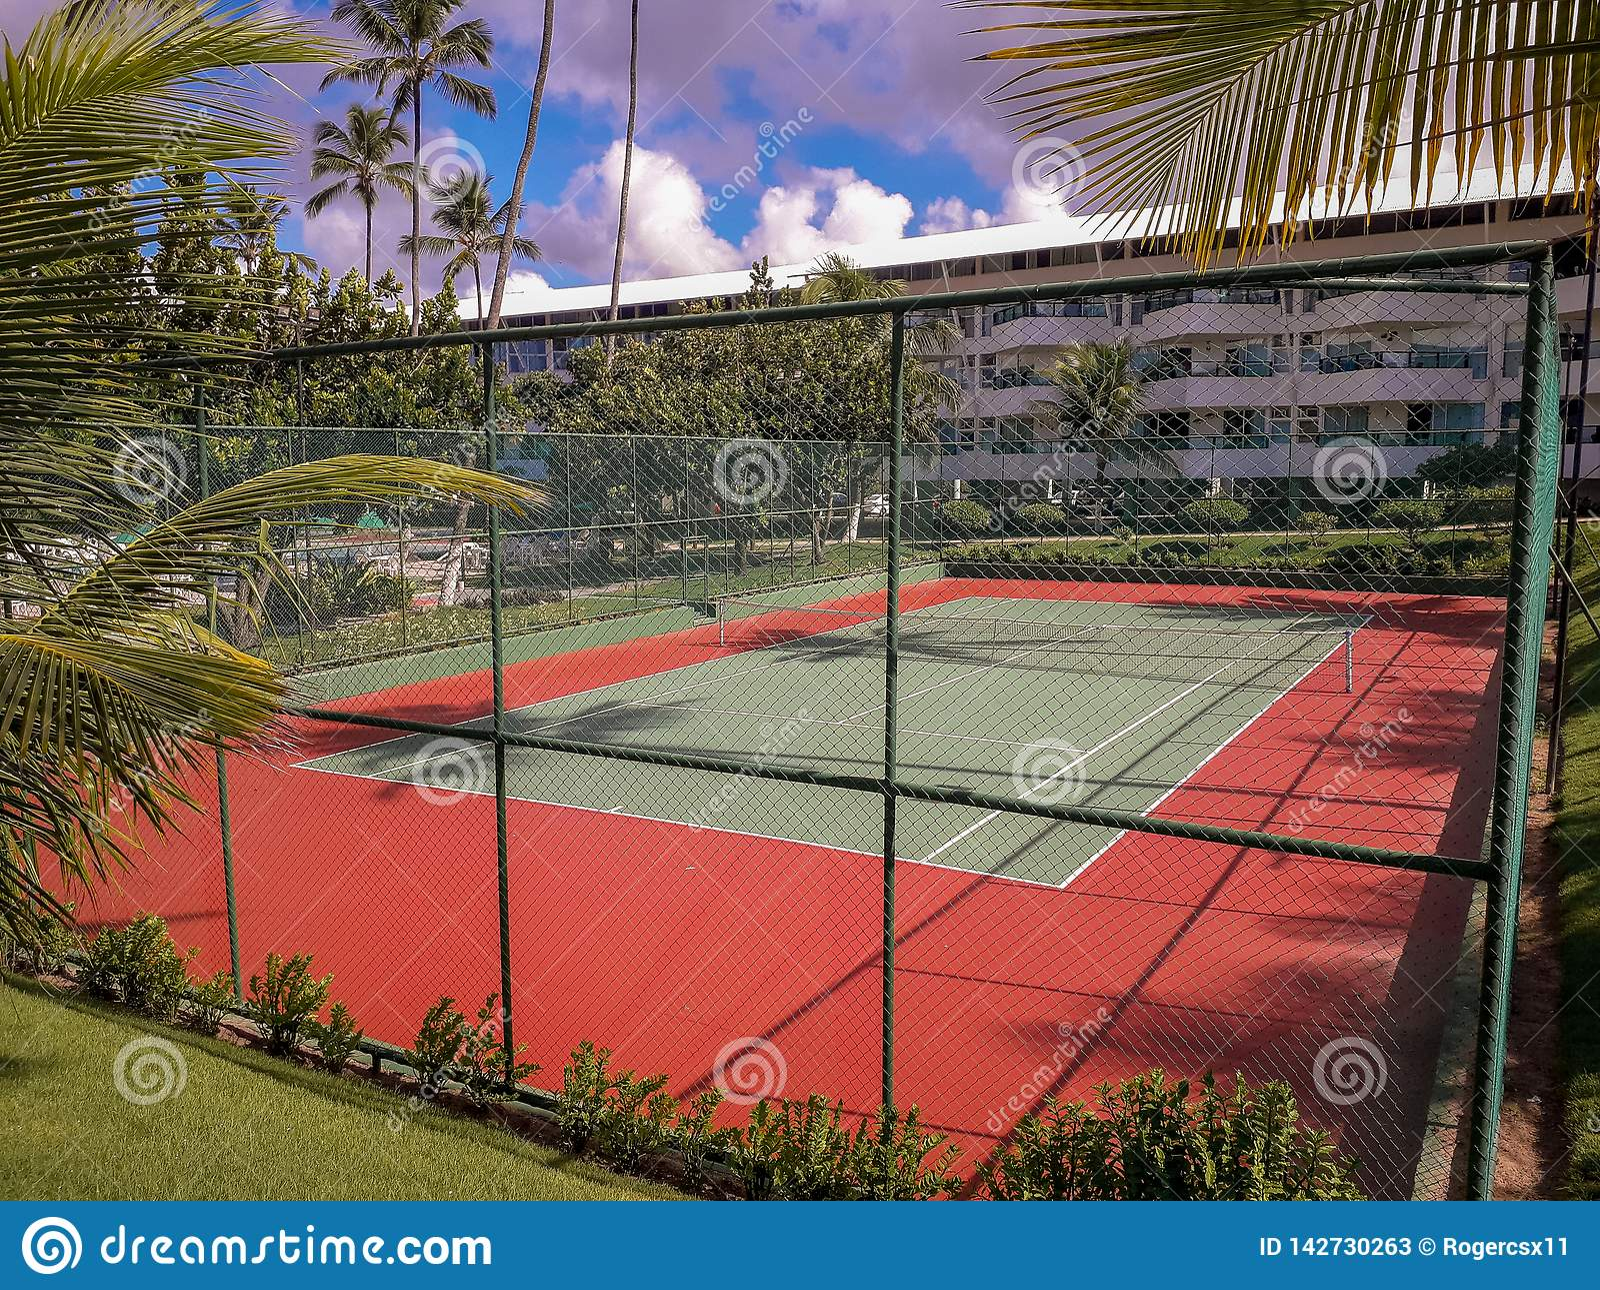 Volleyball court at Flat Resort on Porto de Galinhas, Brazil